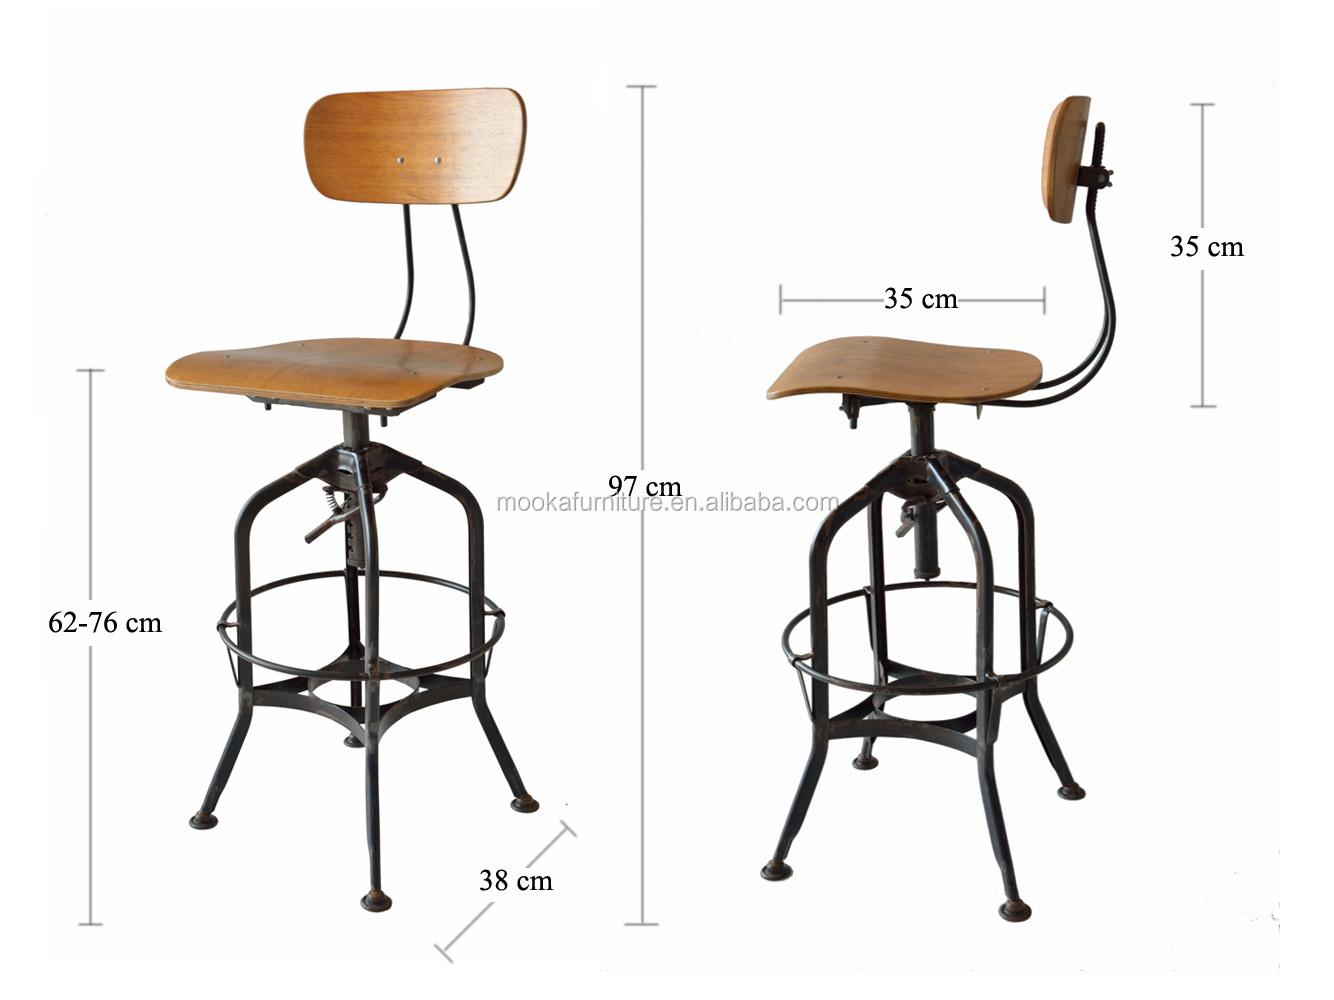 Pics photos bar stools for sale - Hot Sale Industrial Furniture Replica Adjustable Toledo Industrial Bar Stool